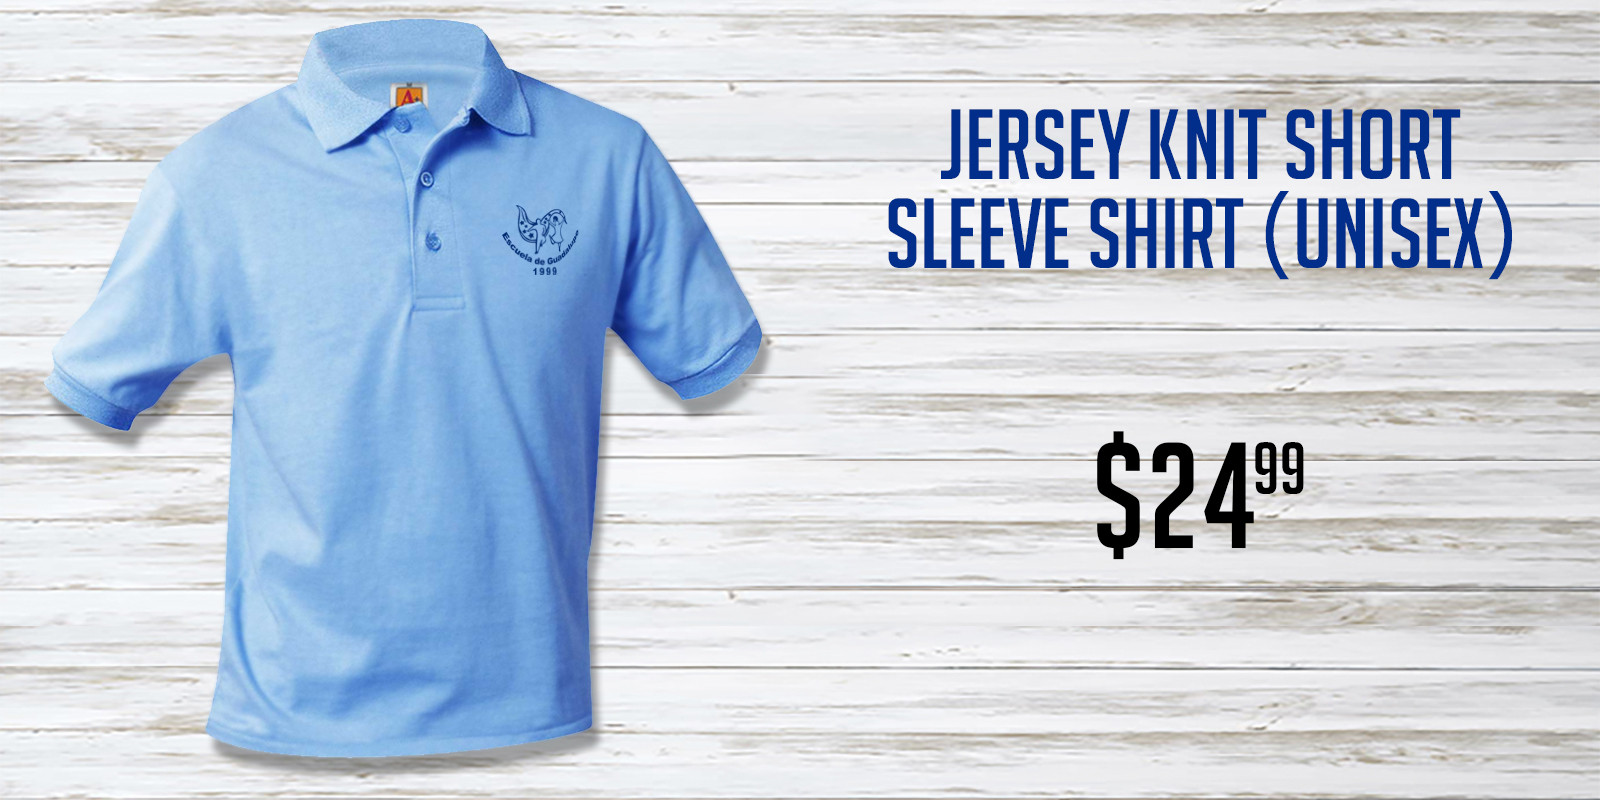 Escuela de Guadalupe Blue Jersey Knit Sh